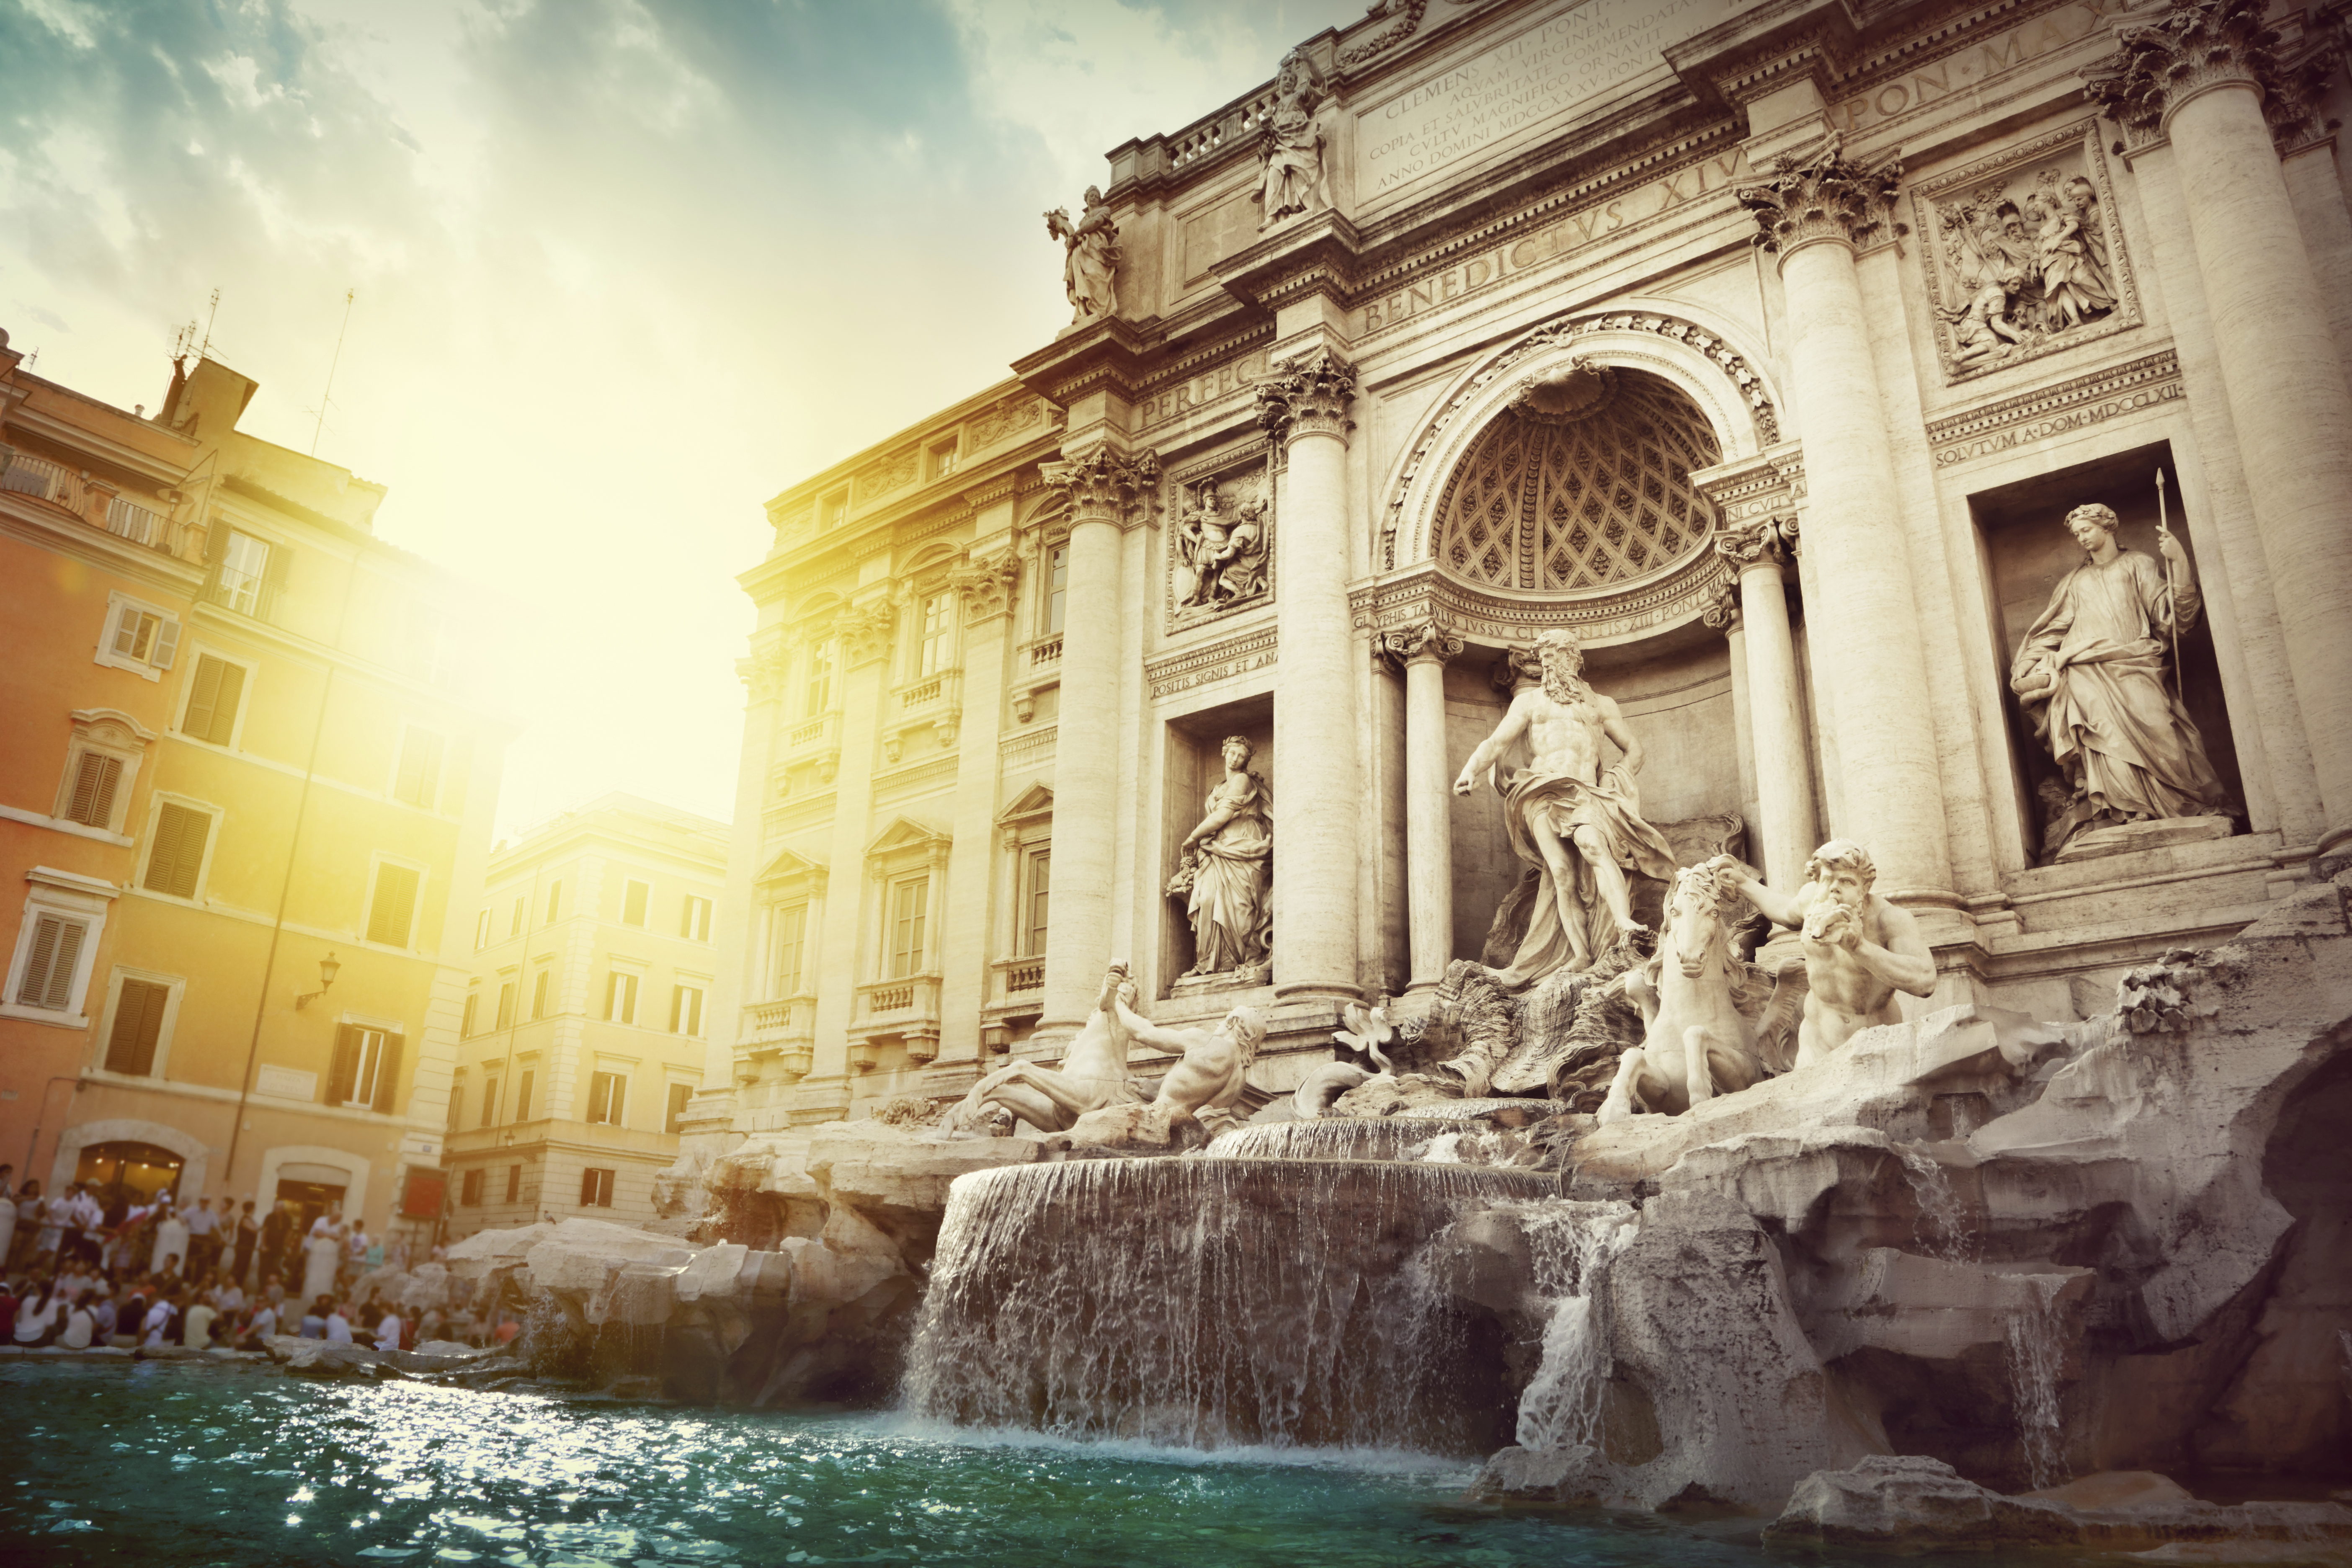 Summer Program - Photography   CIEE High School Summer Abroad: Exploring Rome Through the Arts